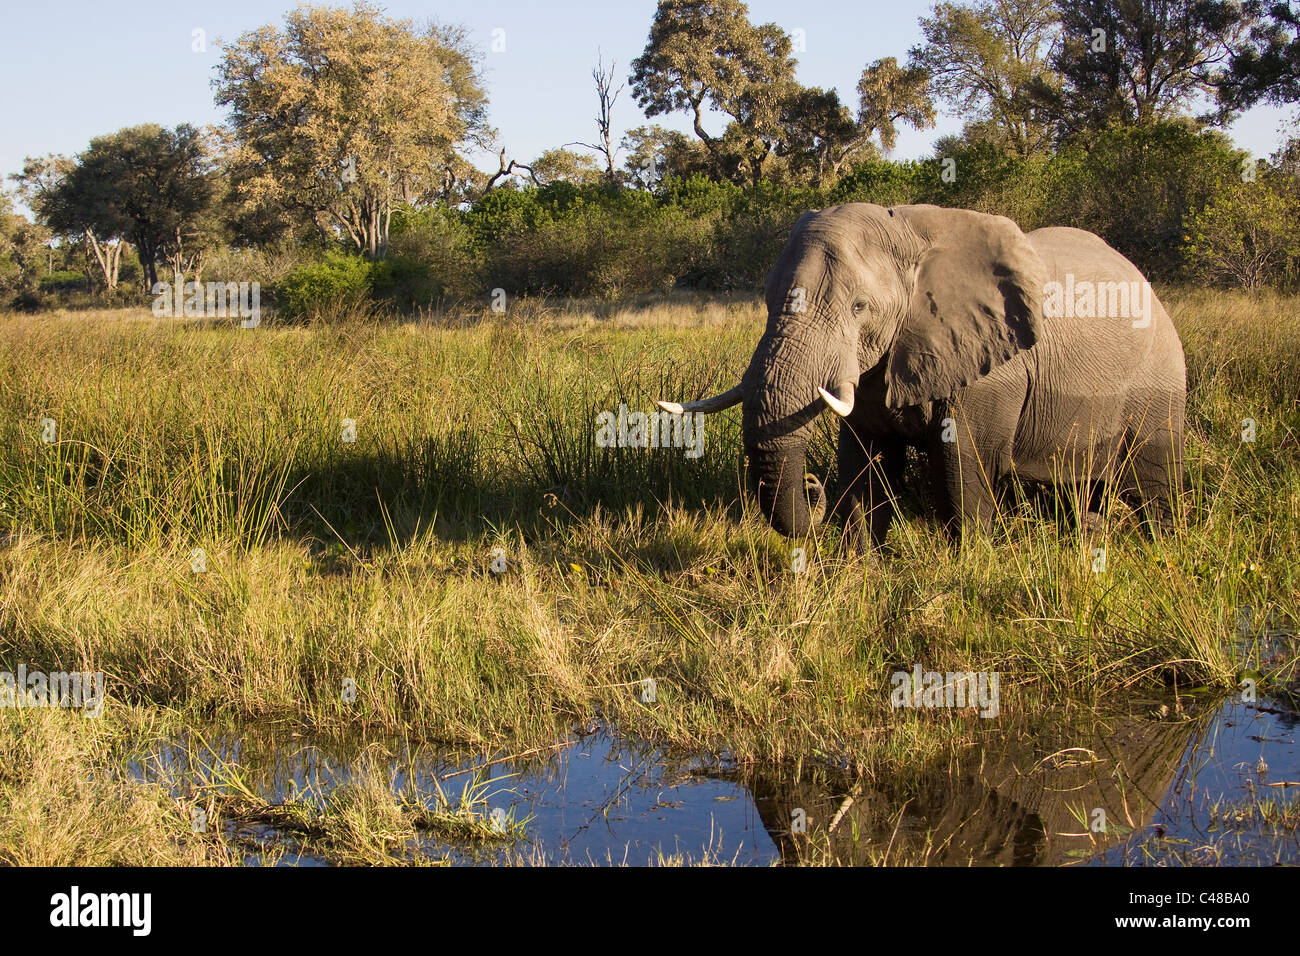 Afrikanischer Elefant (Loxodonta africana), Savuti, Chobe Nationalpark, Botswana, Afrika - Stock Image